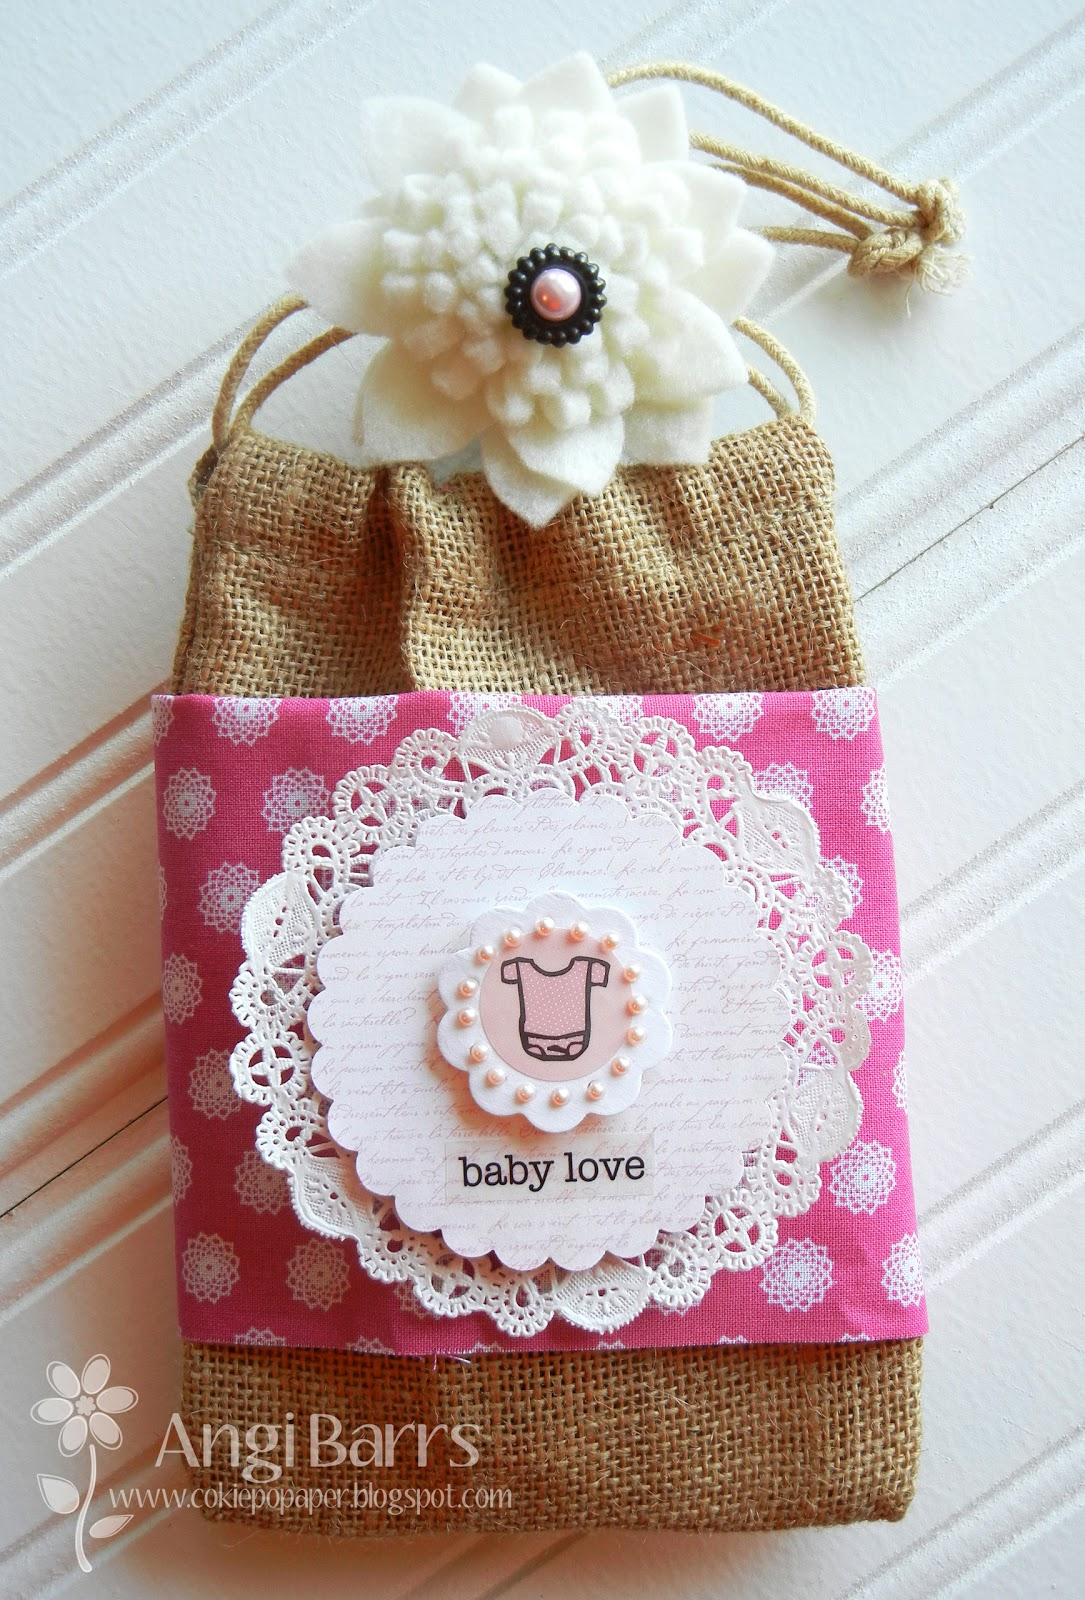 Baby Gift Sack : Cokie pop designs jute baby gift bag